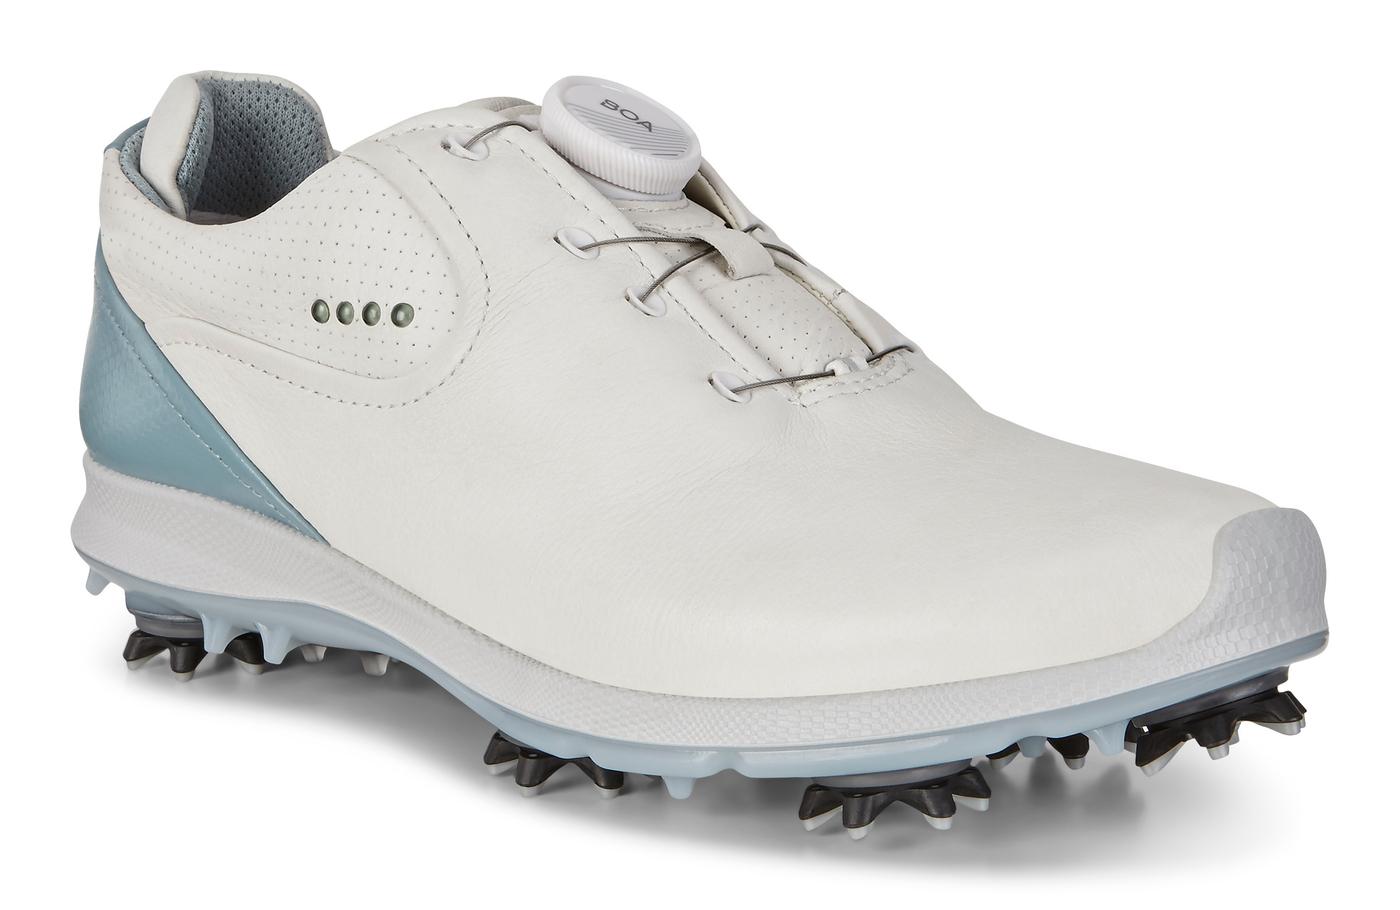 ECCO 여성 골프화 바이옴 G2 고어텍스 101553